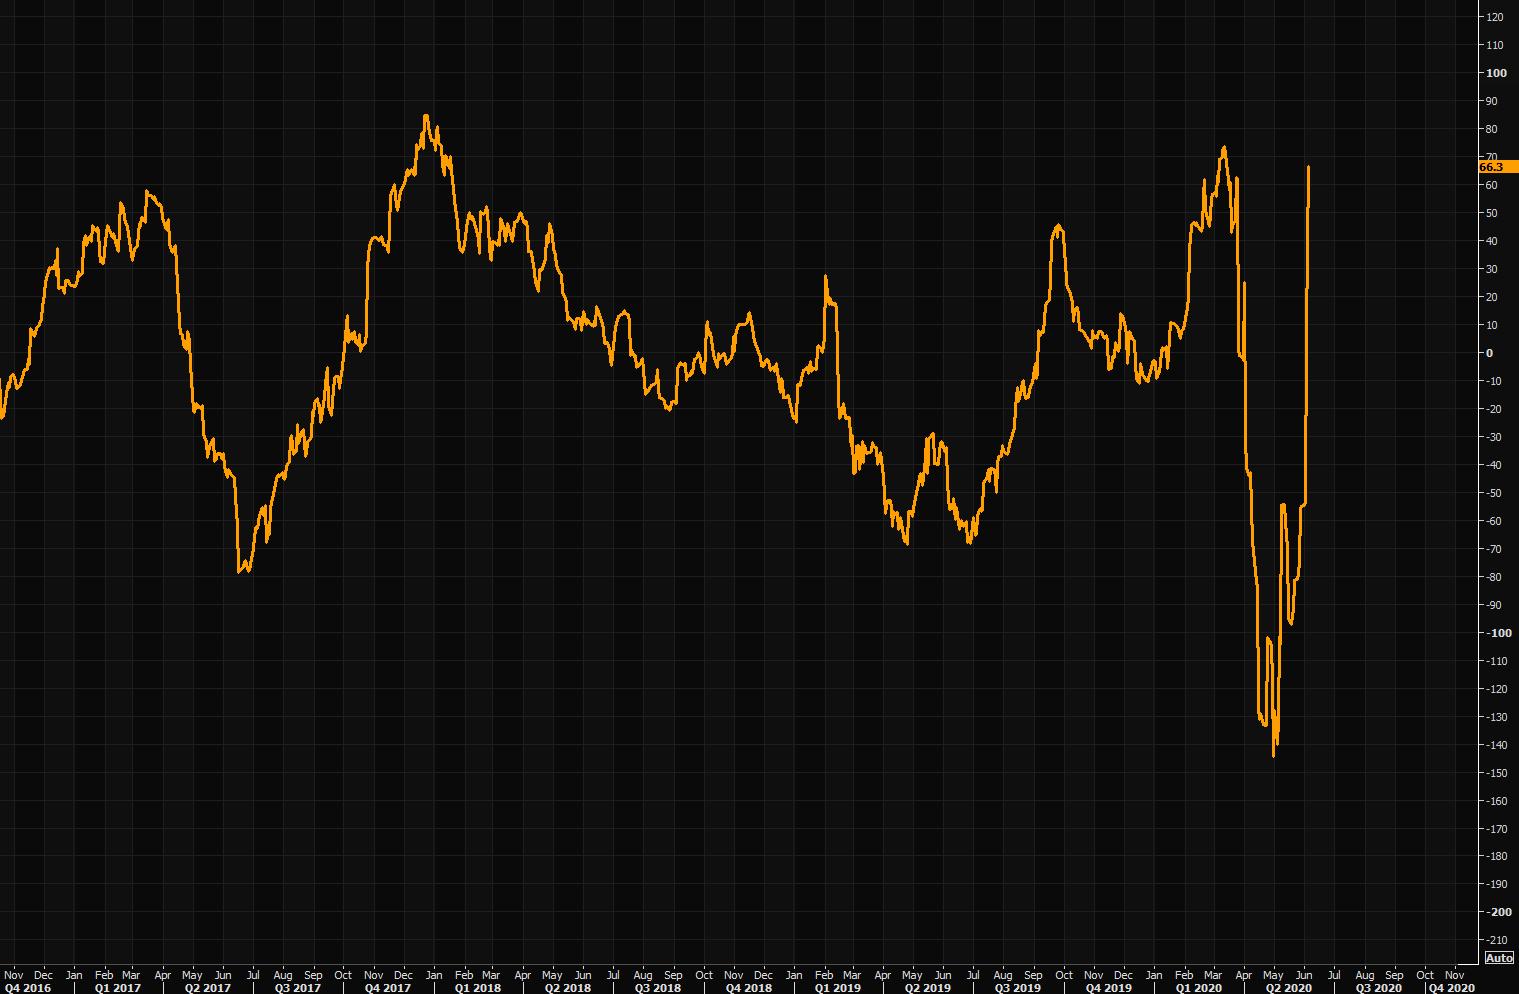 THE V surprise - Citi economic surprise index